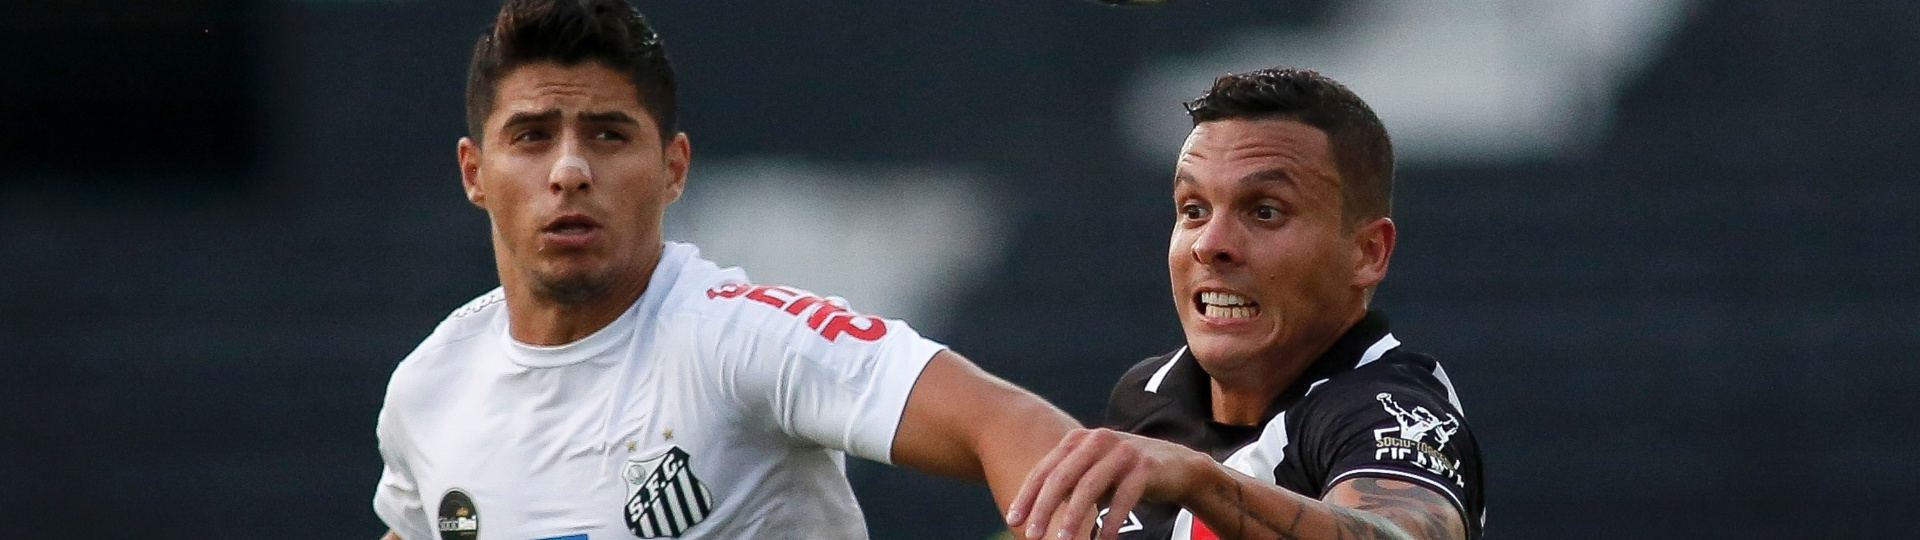 Ramon (direita) lamentou a falta de torcida do Vasco